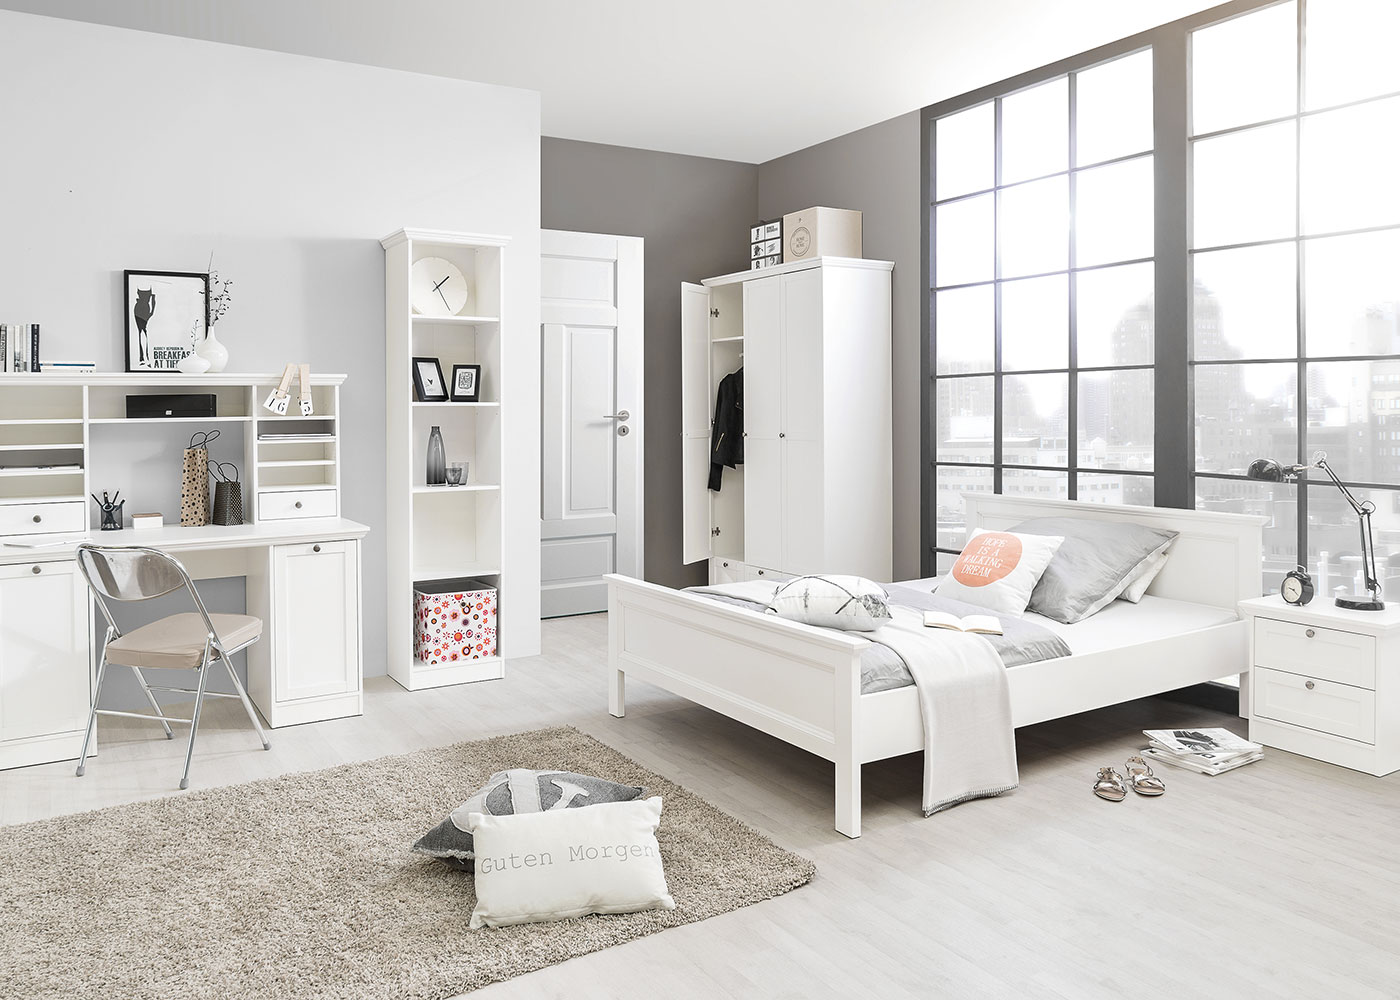 poste country 180 x 200 cm design discount. Black Bedroom Furniture Sets. Home Design Ideas